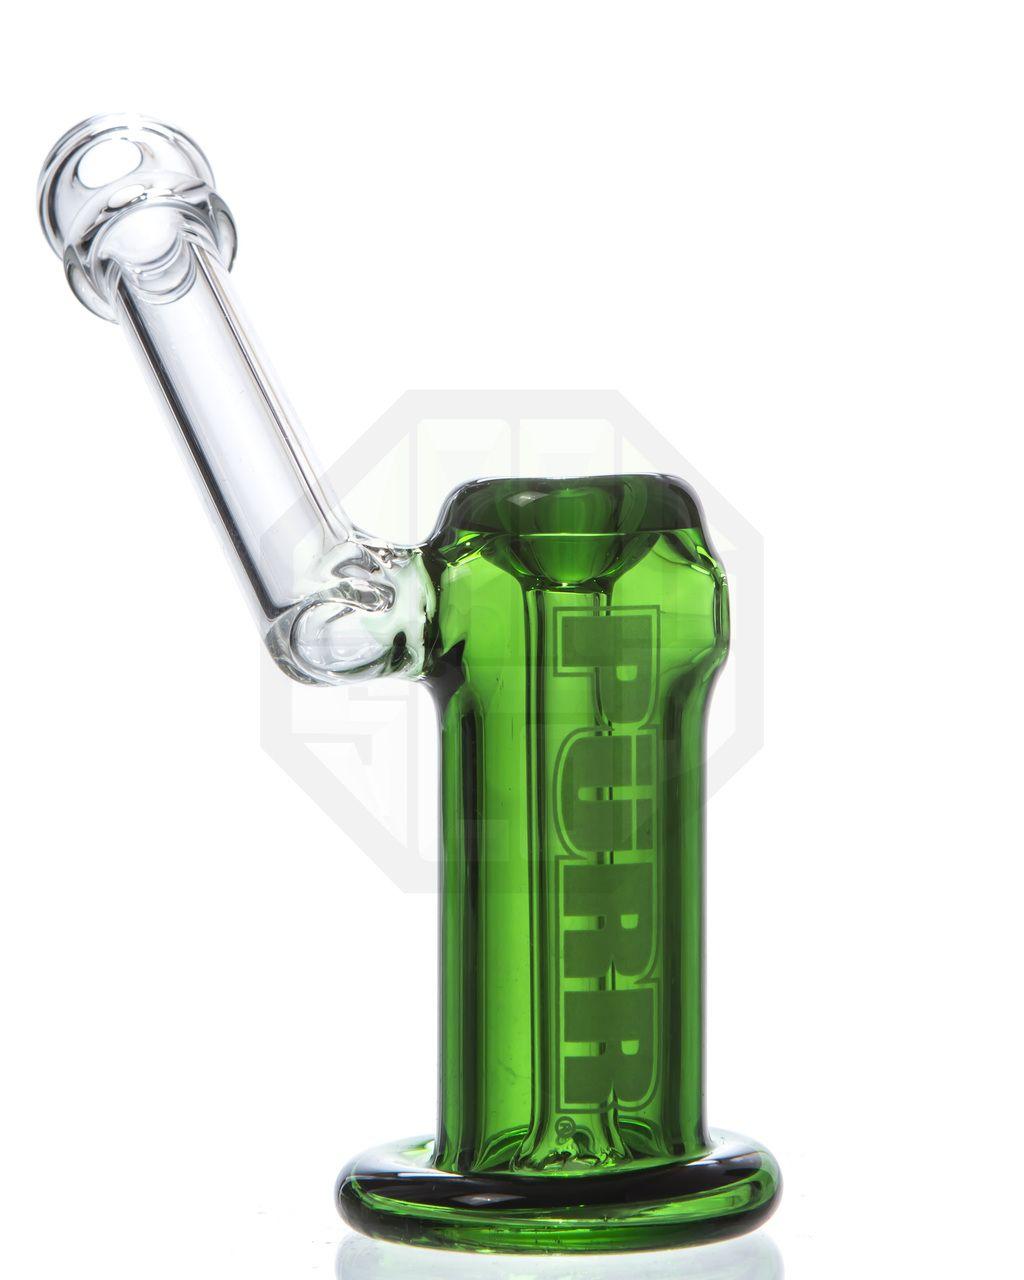 purr glass pocket sidecar bubbler